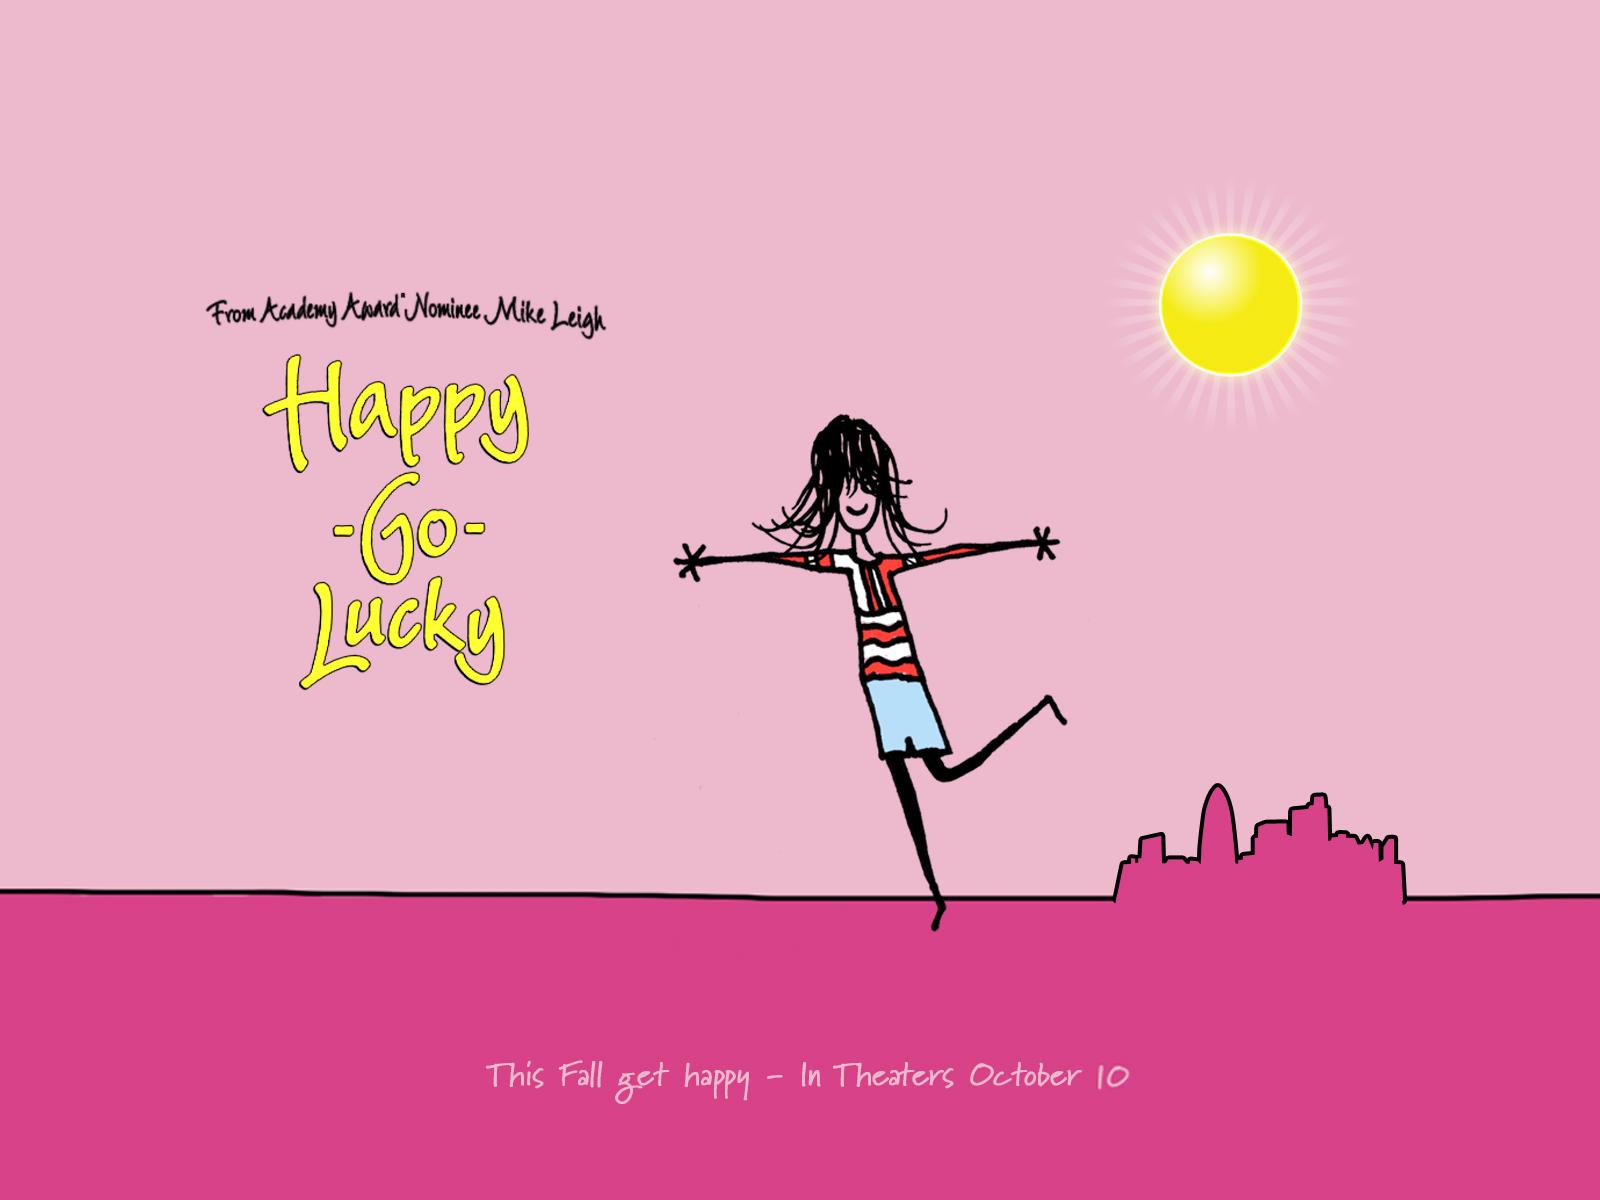 http://3.bp.blogspot.com/-mlpVzUXBMII/UDZEAdHuoGI/AAAAAAAAAis/3_JwTrl_QPo/s1600/Sally_Hawkins_in_Happy_Go_Lucky_Wallpaper_4_1280.jpg